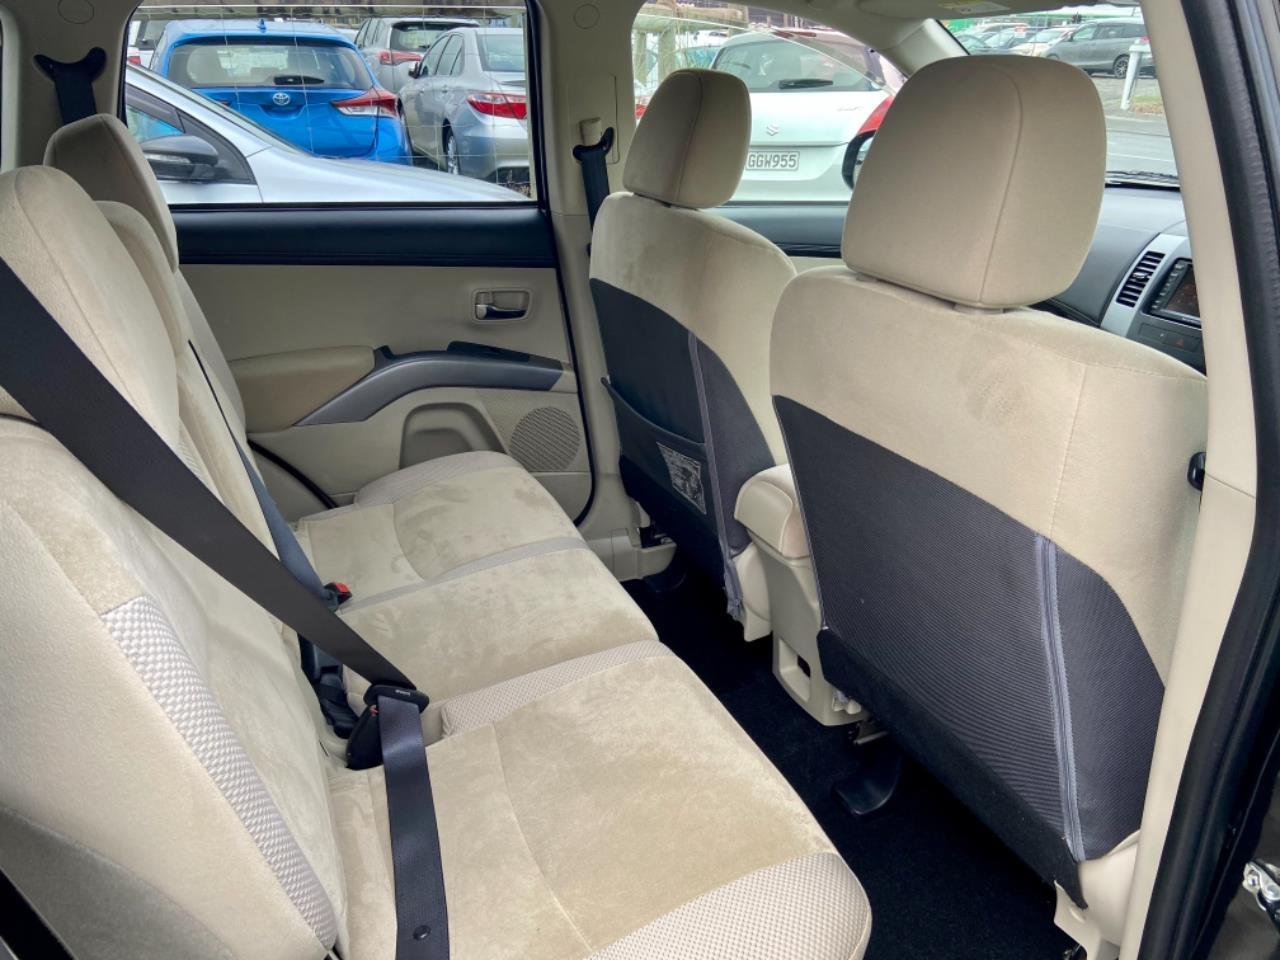 image-16, 2010 Mitsubishi Outlander 24G 4WD 7 Seater Facelif at Christchurch